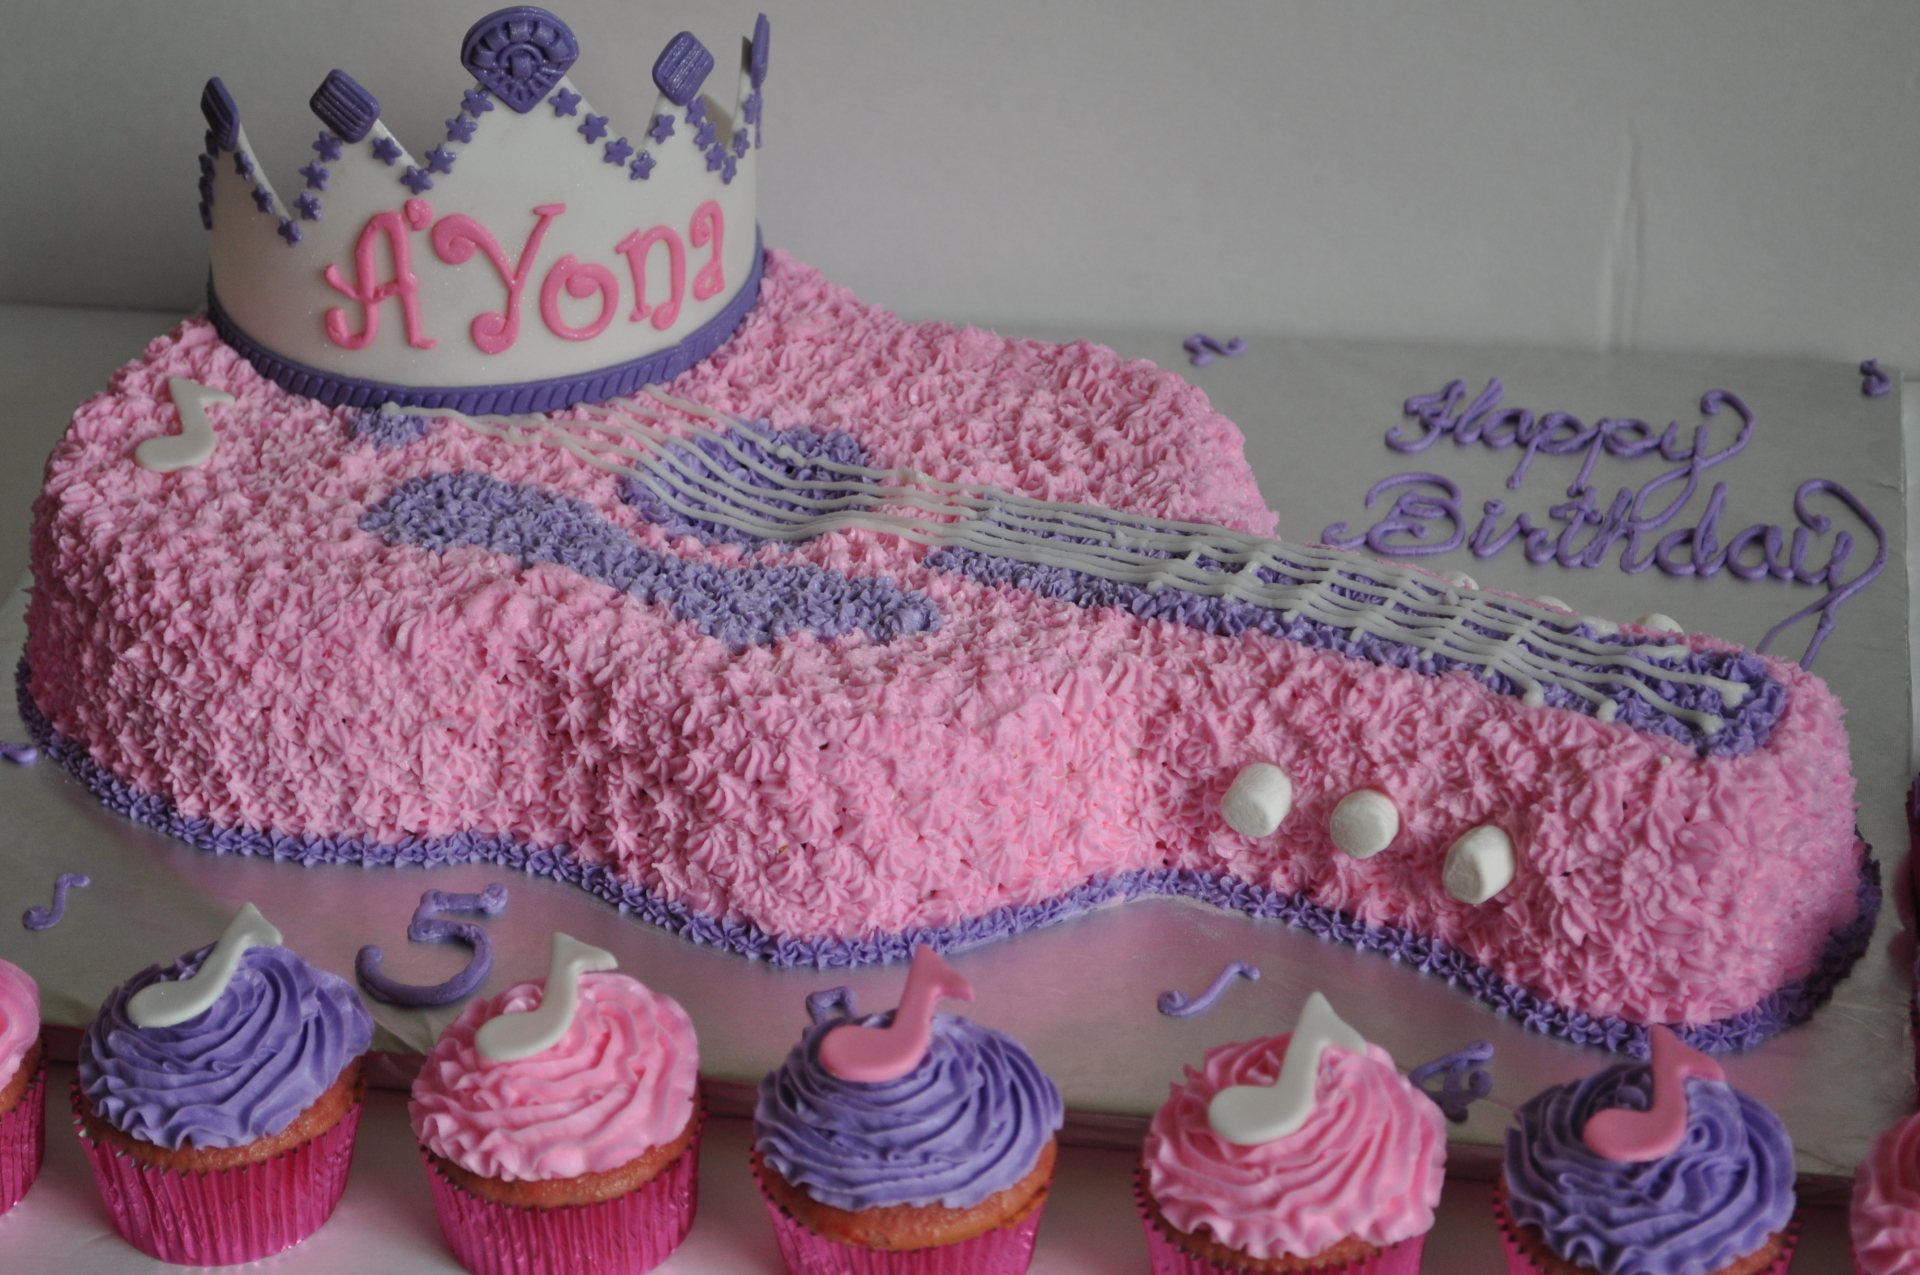 Guitar cake, tiara cake cupcakes